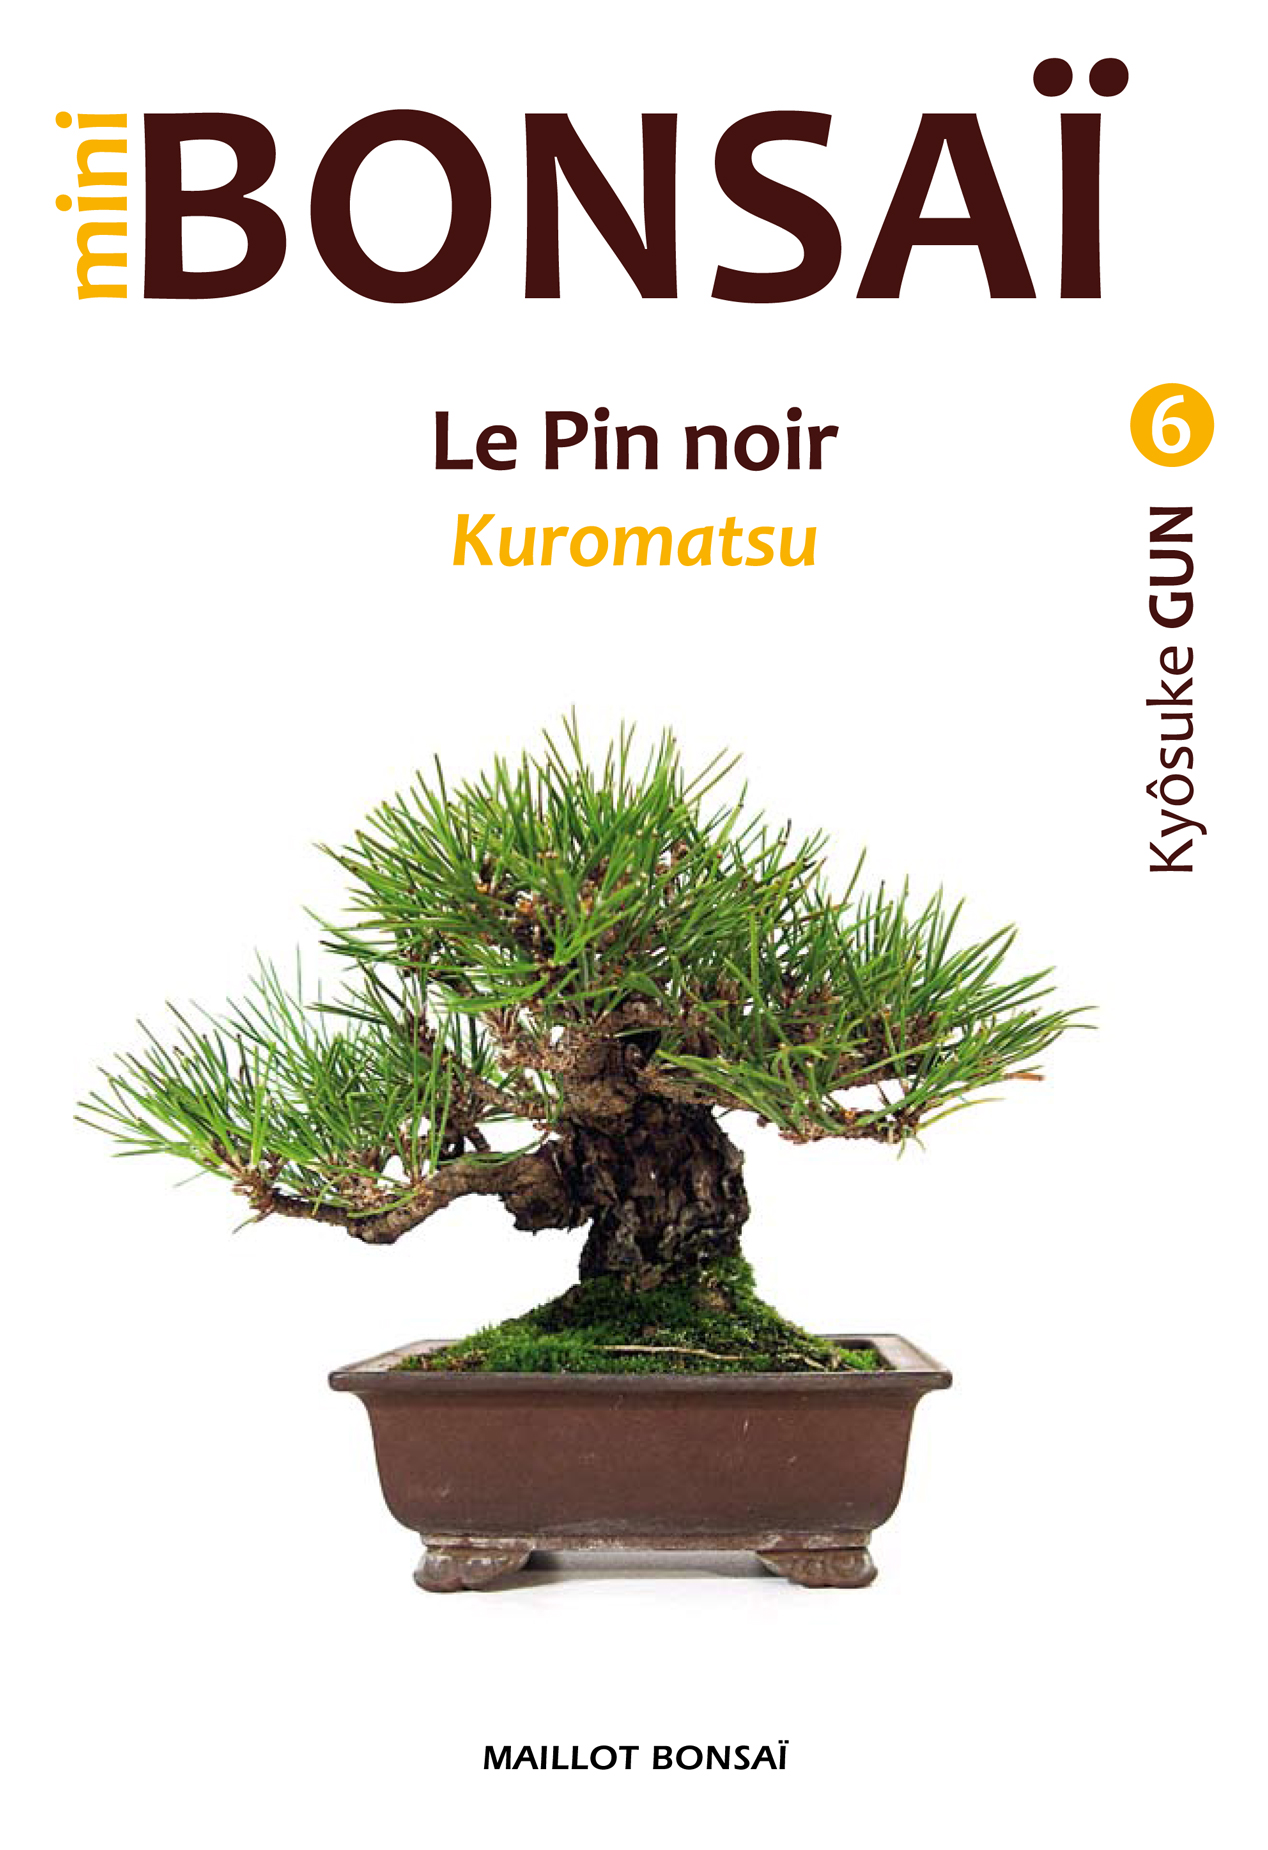 livre sur les mini bonsai de pin noir par Kyosuke Gun